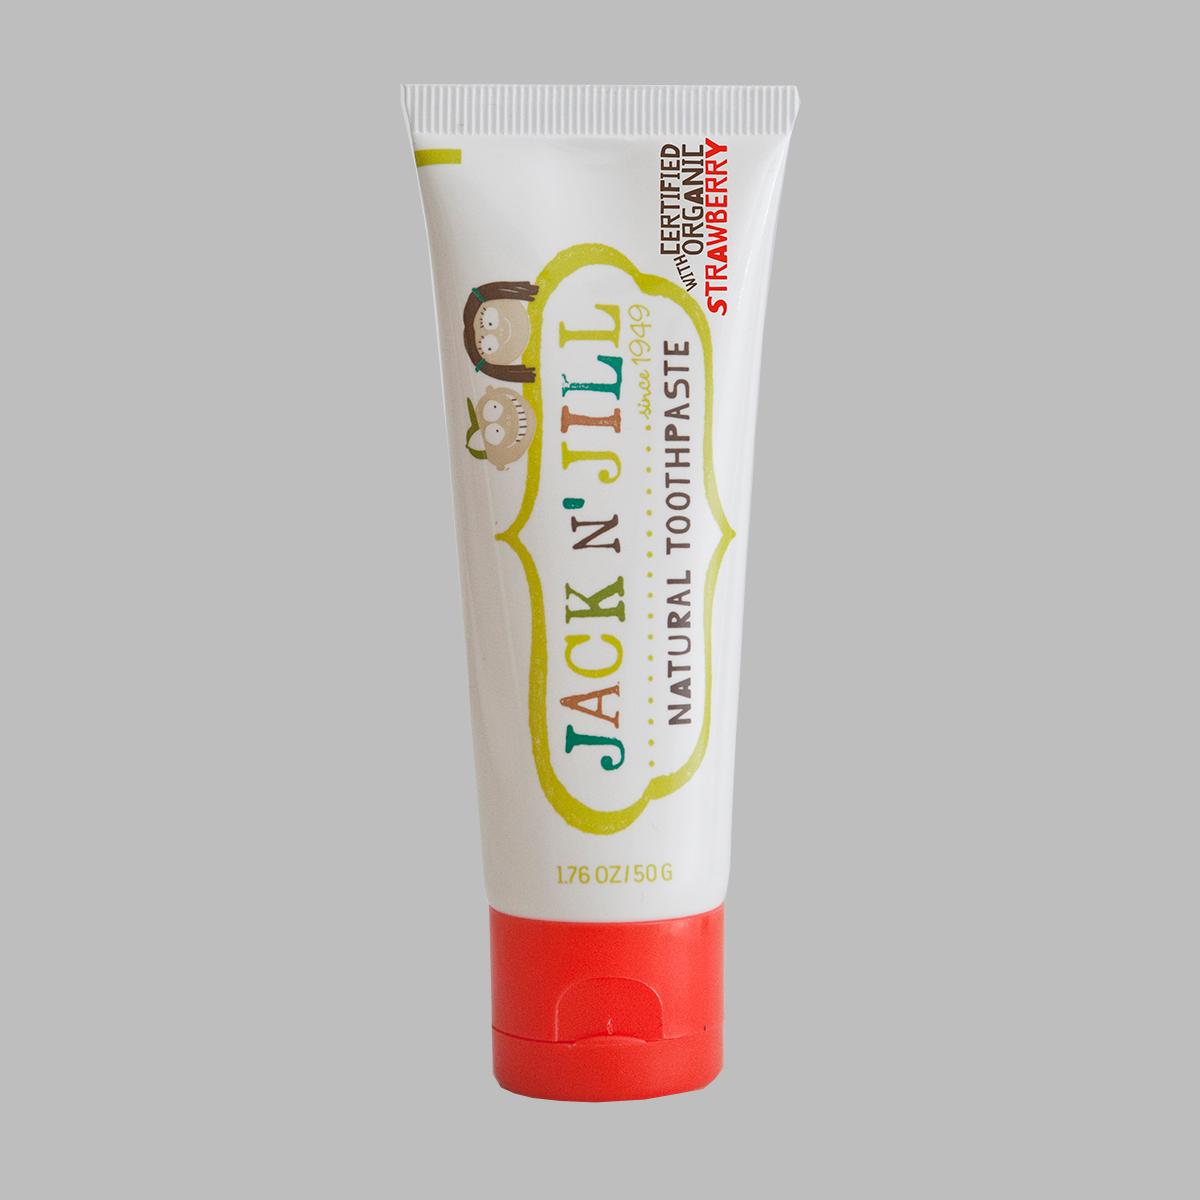 Jack n' Jill - Natural Organic Children's Toothpaste (Strawberry) 50g